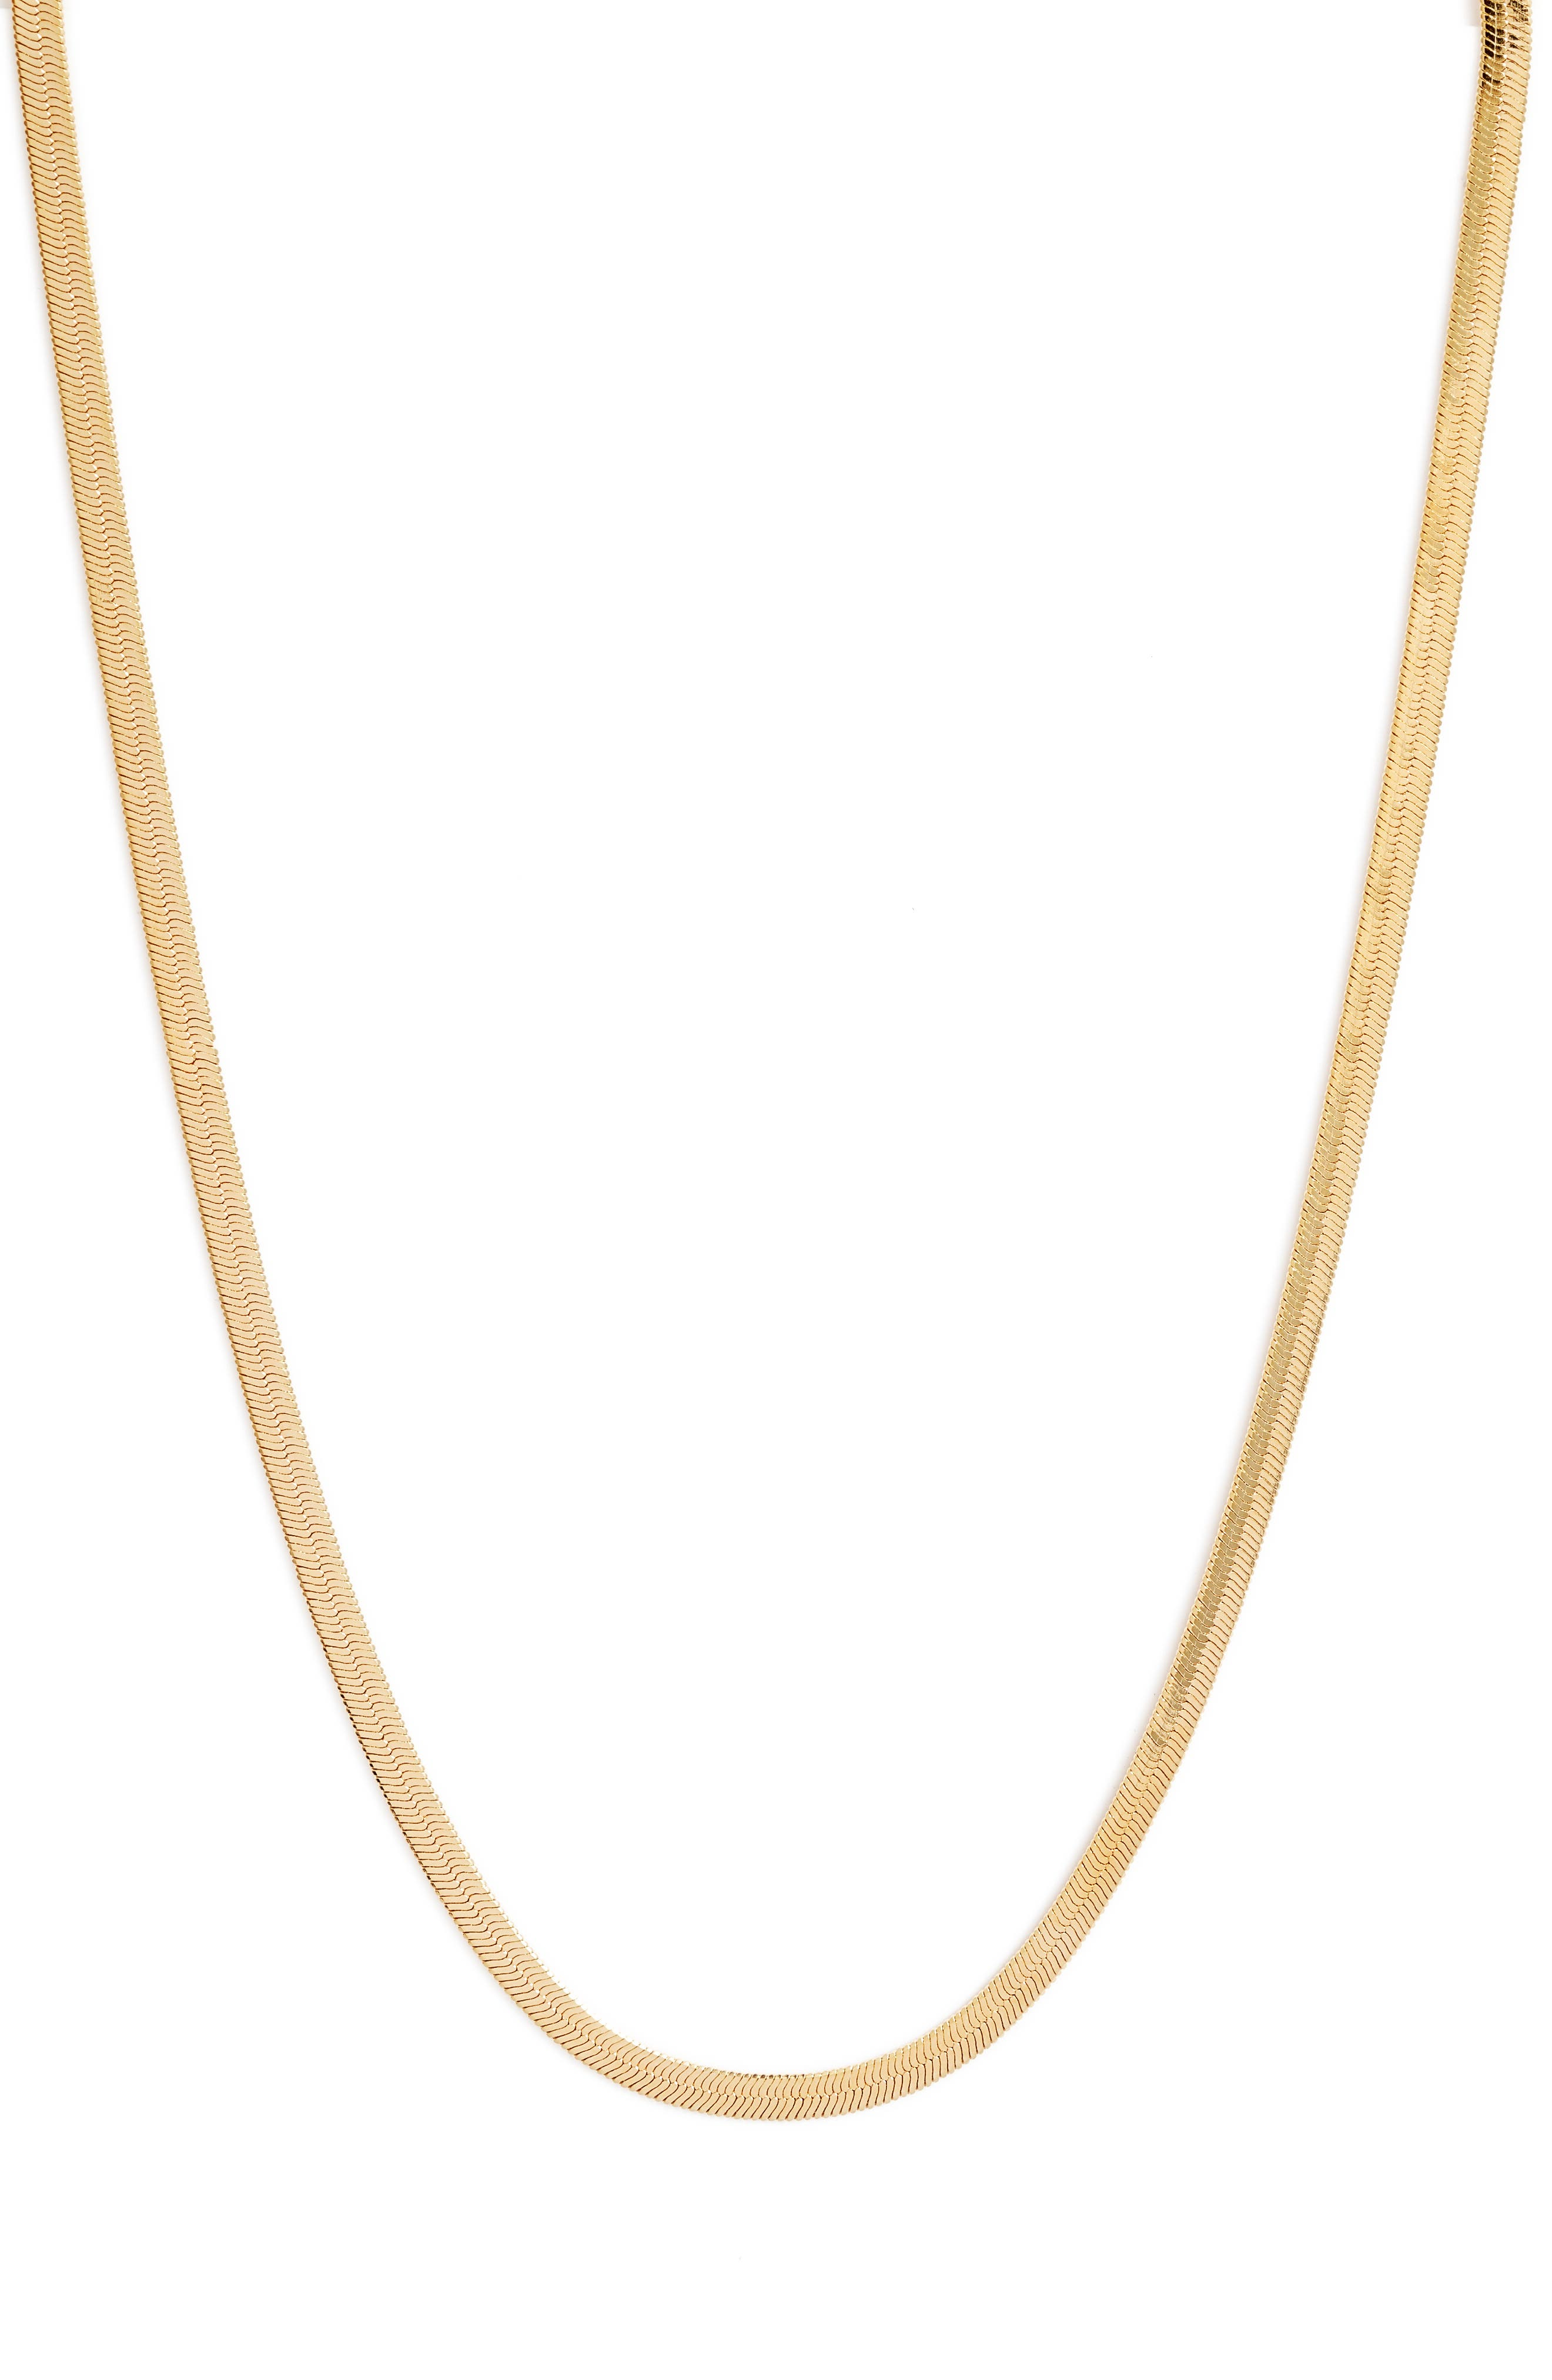 Skinny Monte Carlo Chain Necklace